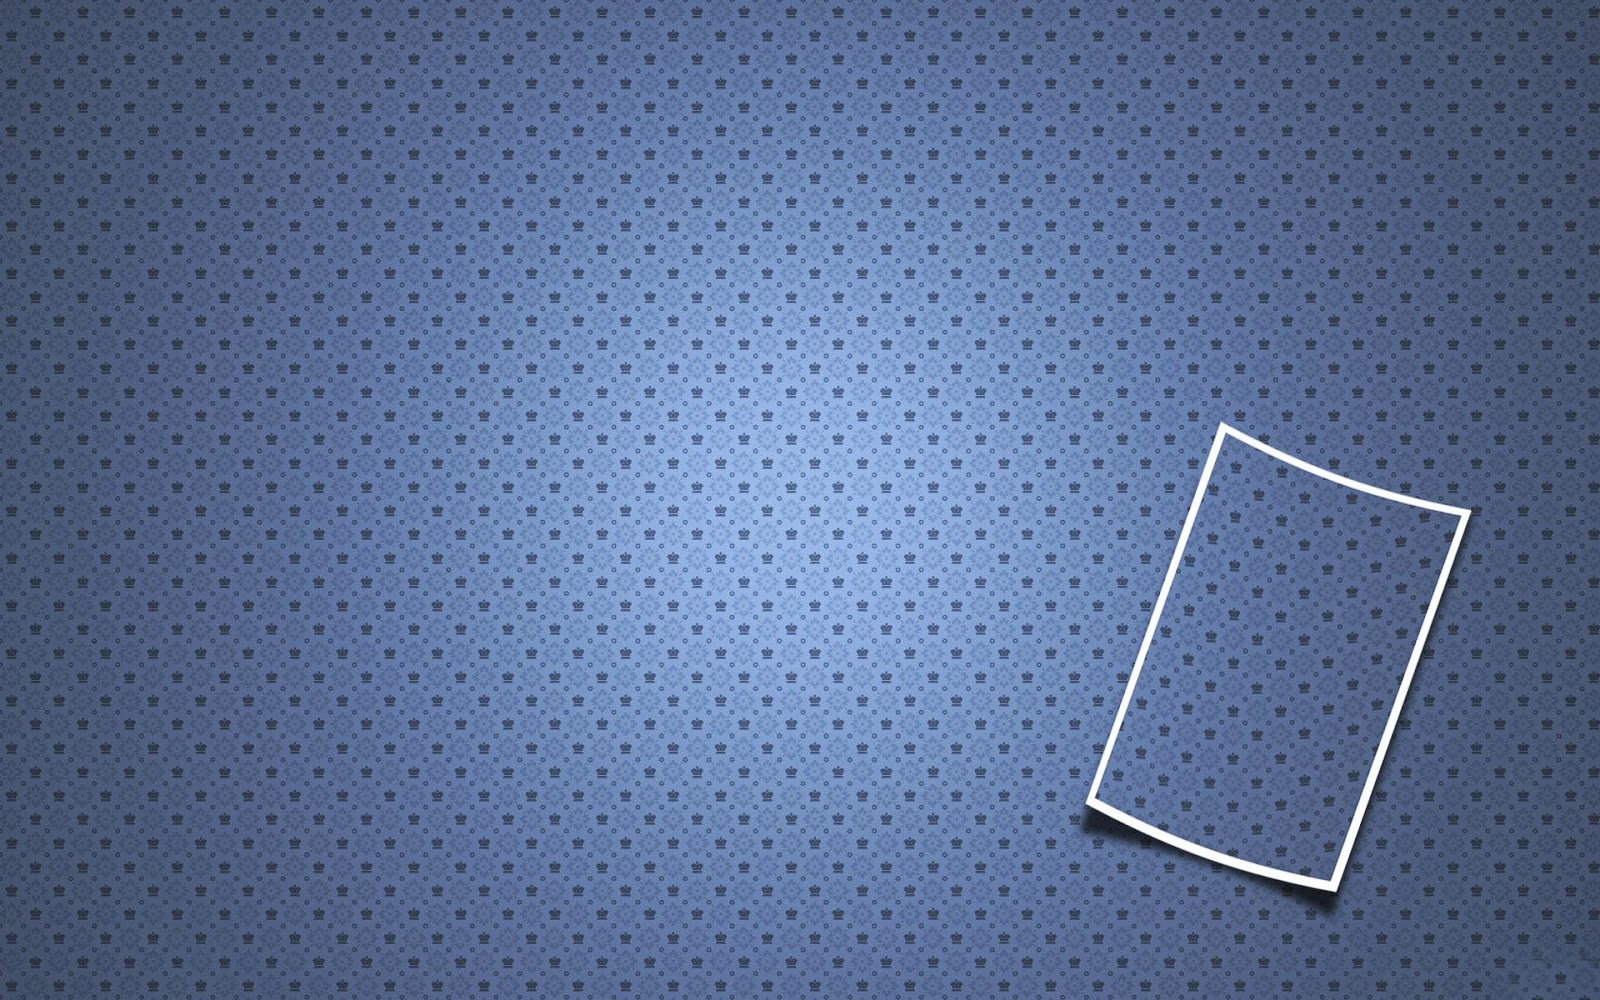 Desktop Photography Wallpapers HD 1080p